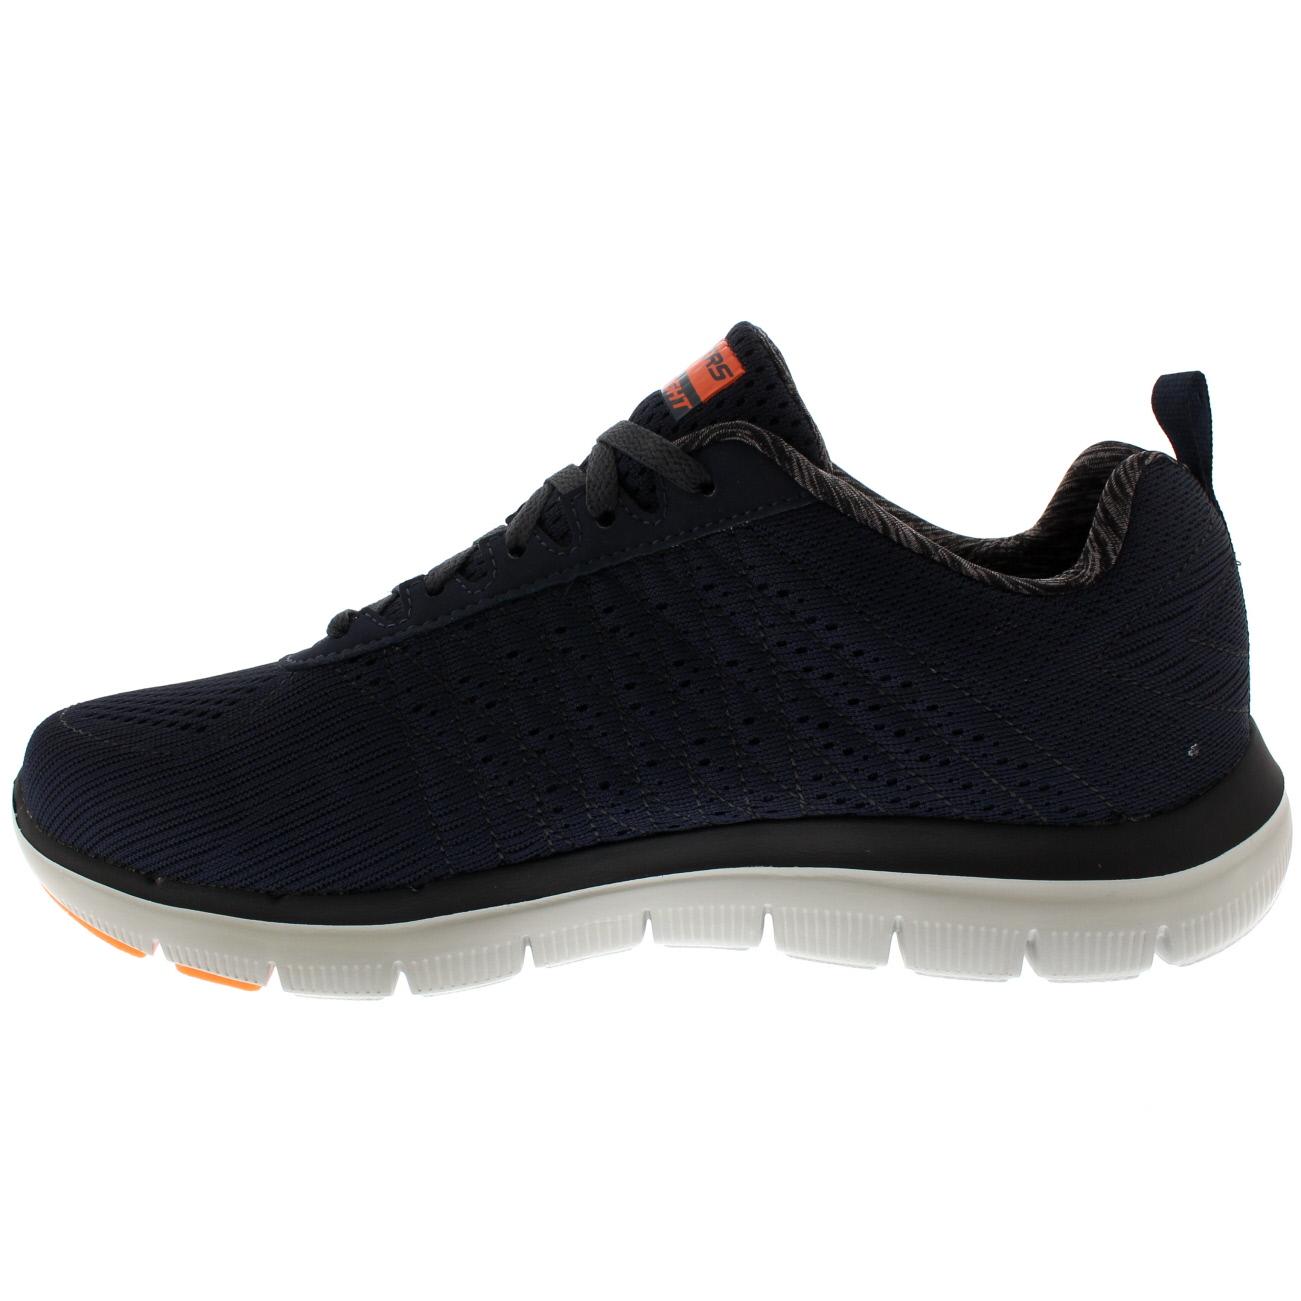 skechers memory foam lightweight shoes Sale,up to 35 ...